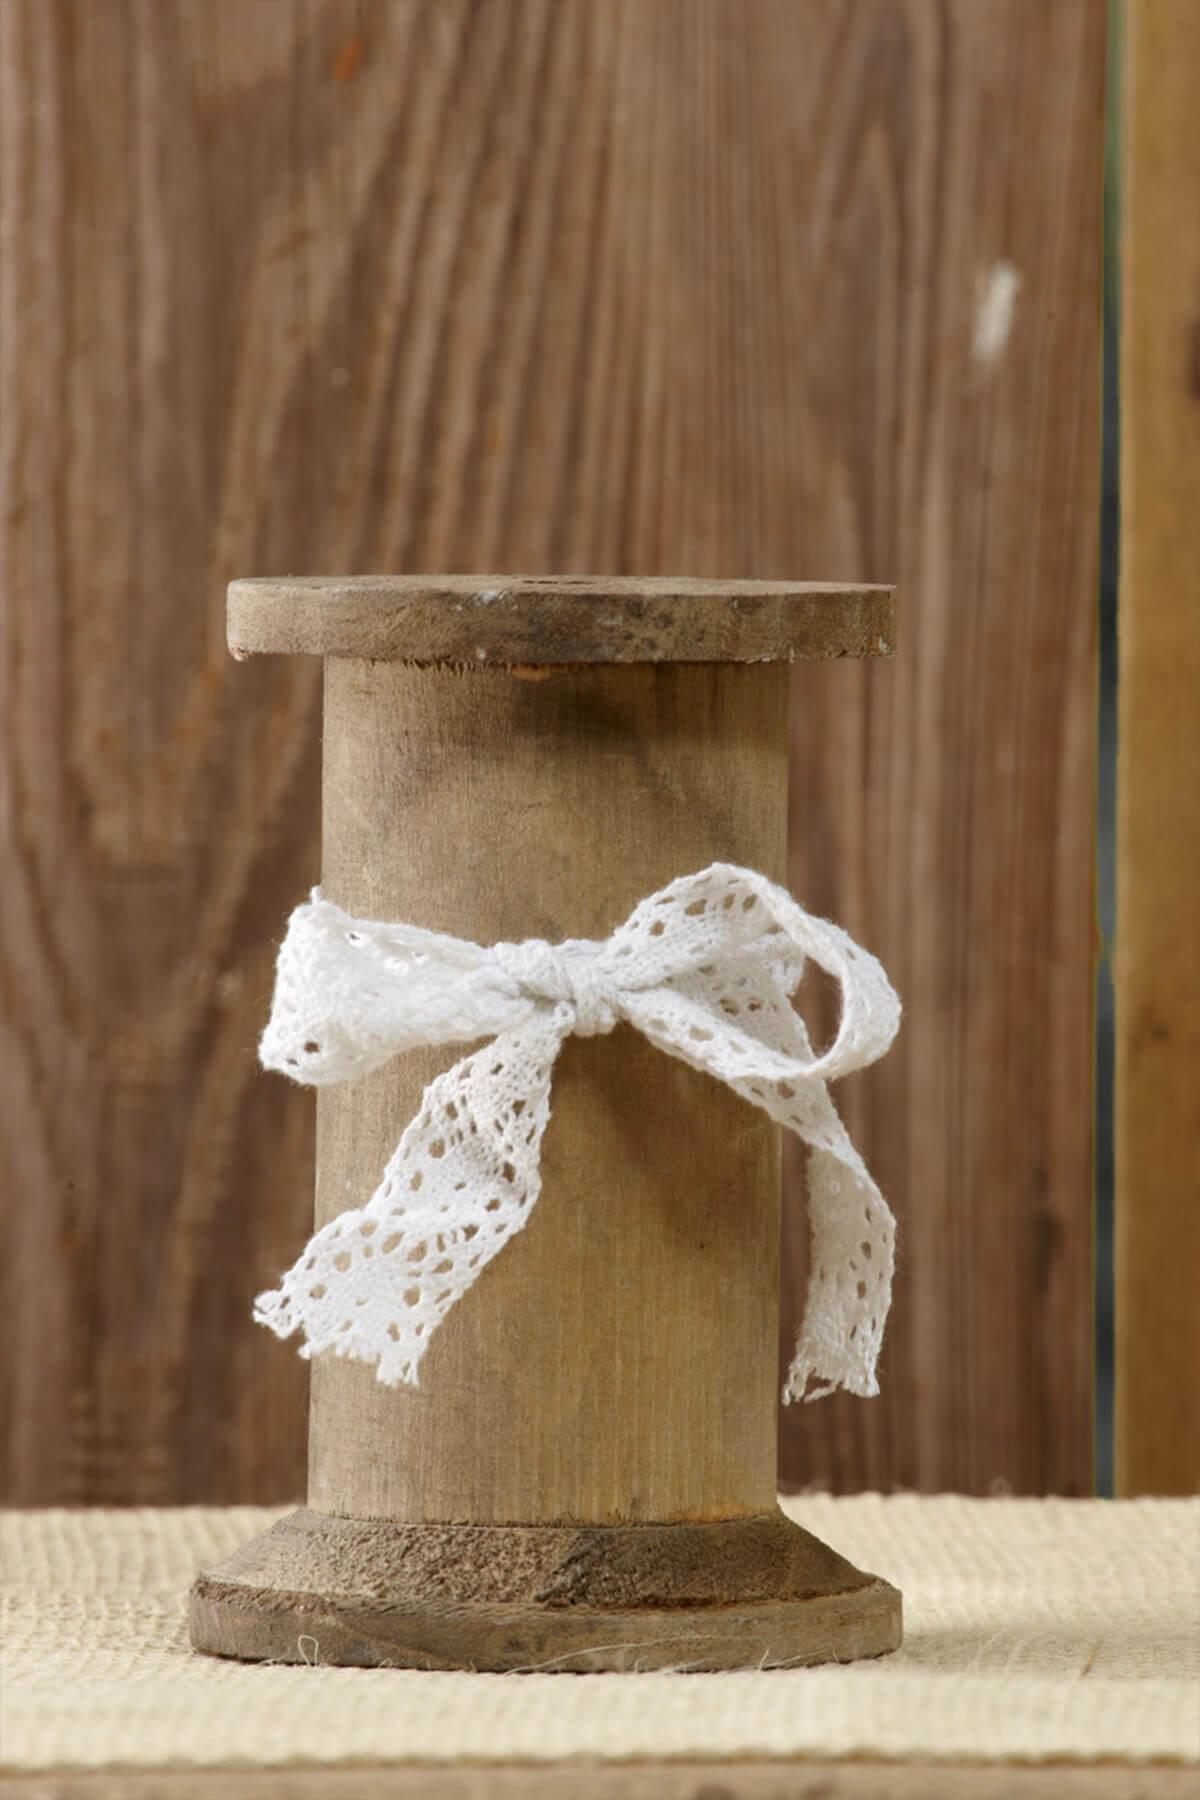 Wood Spool Candleholders 5in